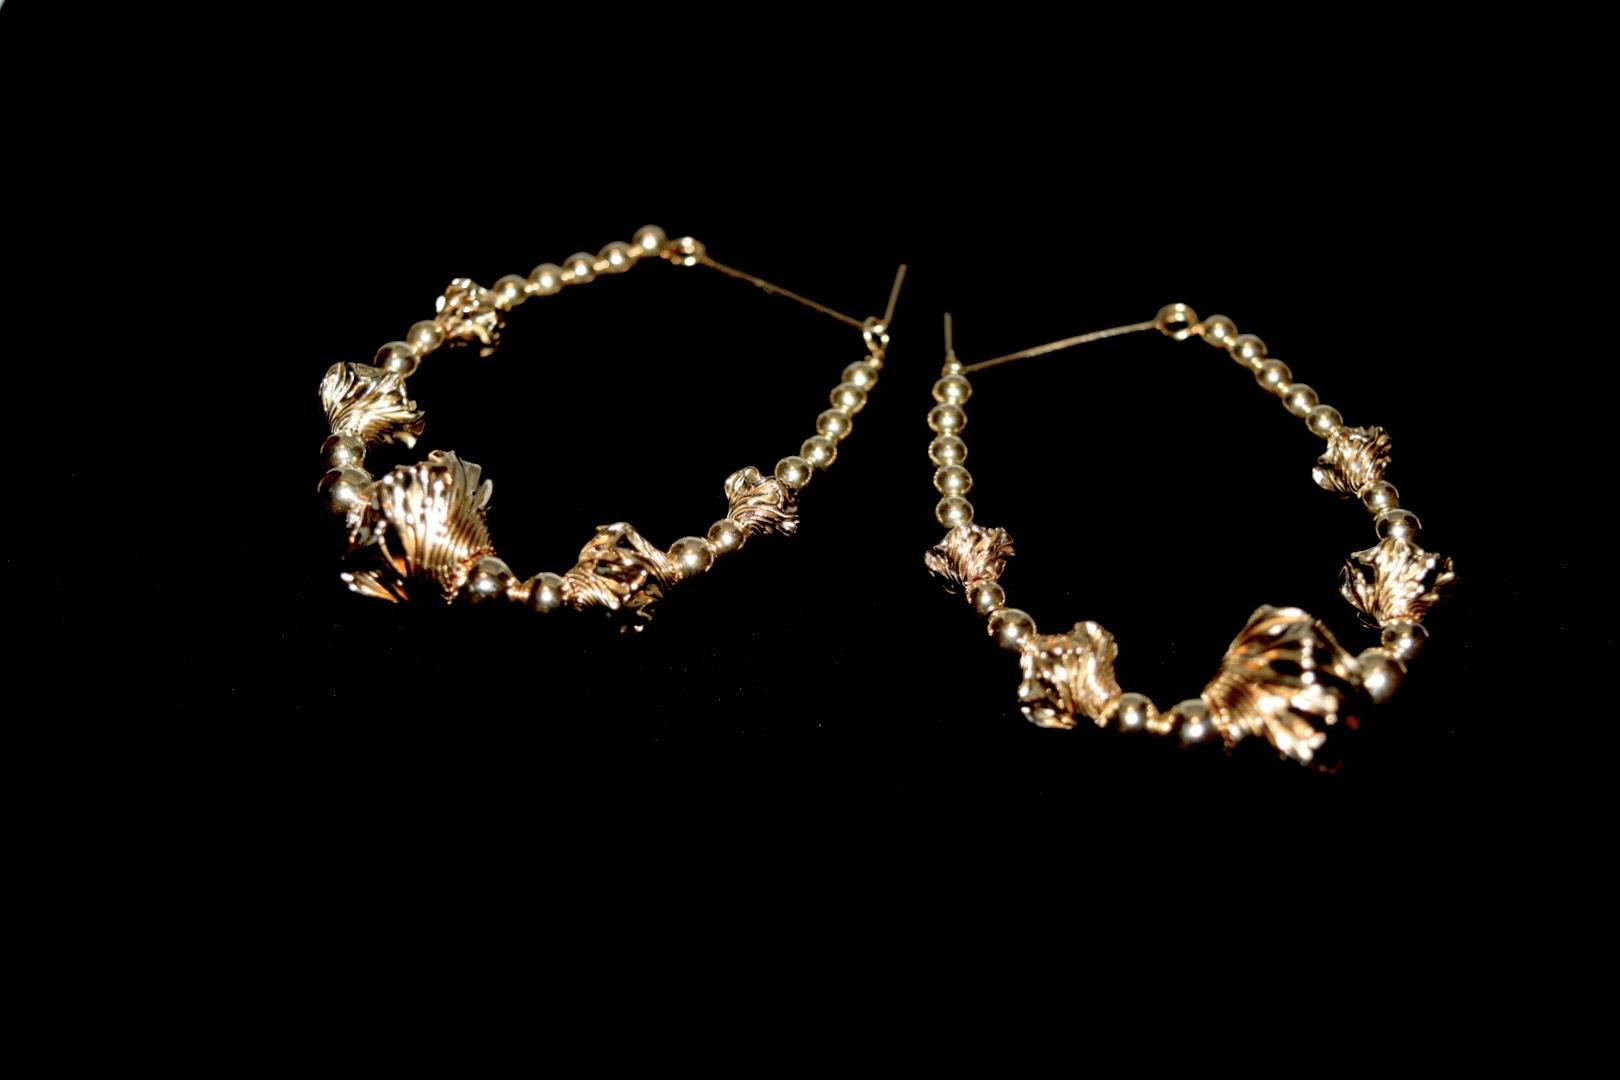 Beads by Jaira Photos